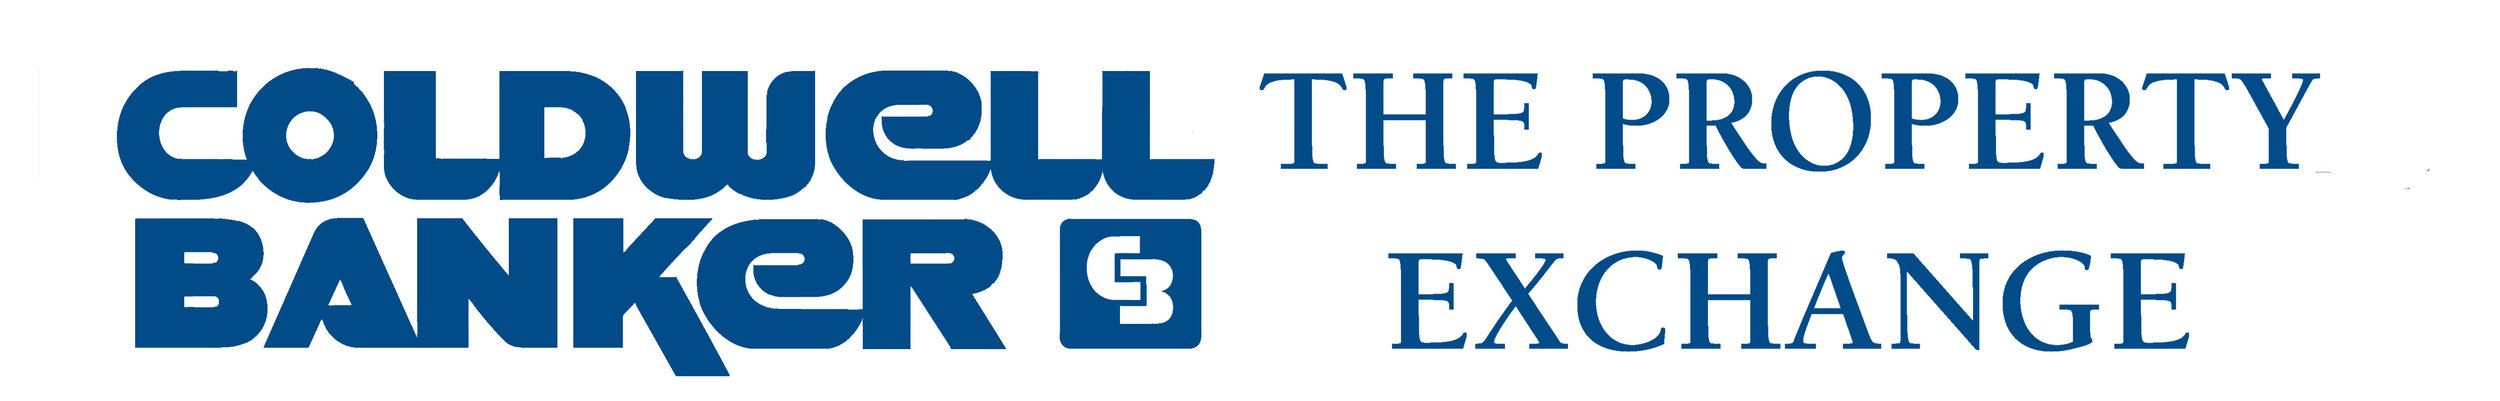 3d-cbtpe-all-blue side by side.jpg